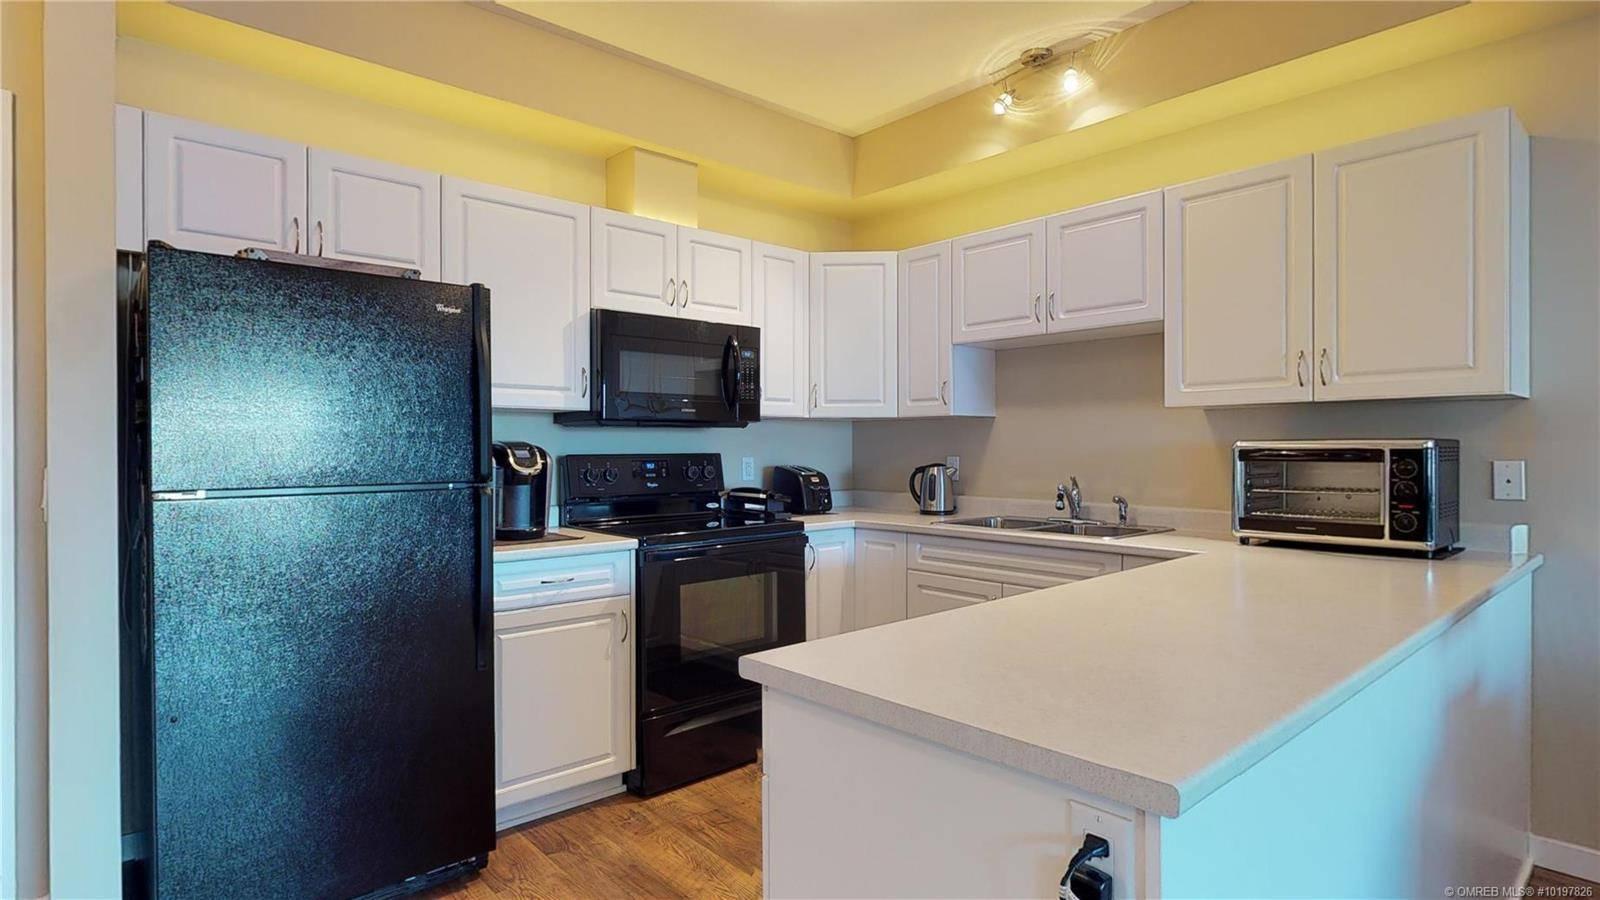 Condo for sale at 770 Rutland Rd North Unit 301 Kelowna British Columbia - MLS: 10197826